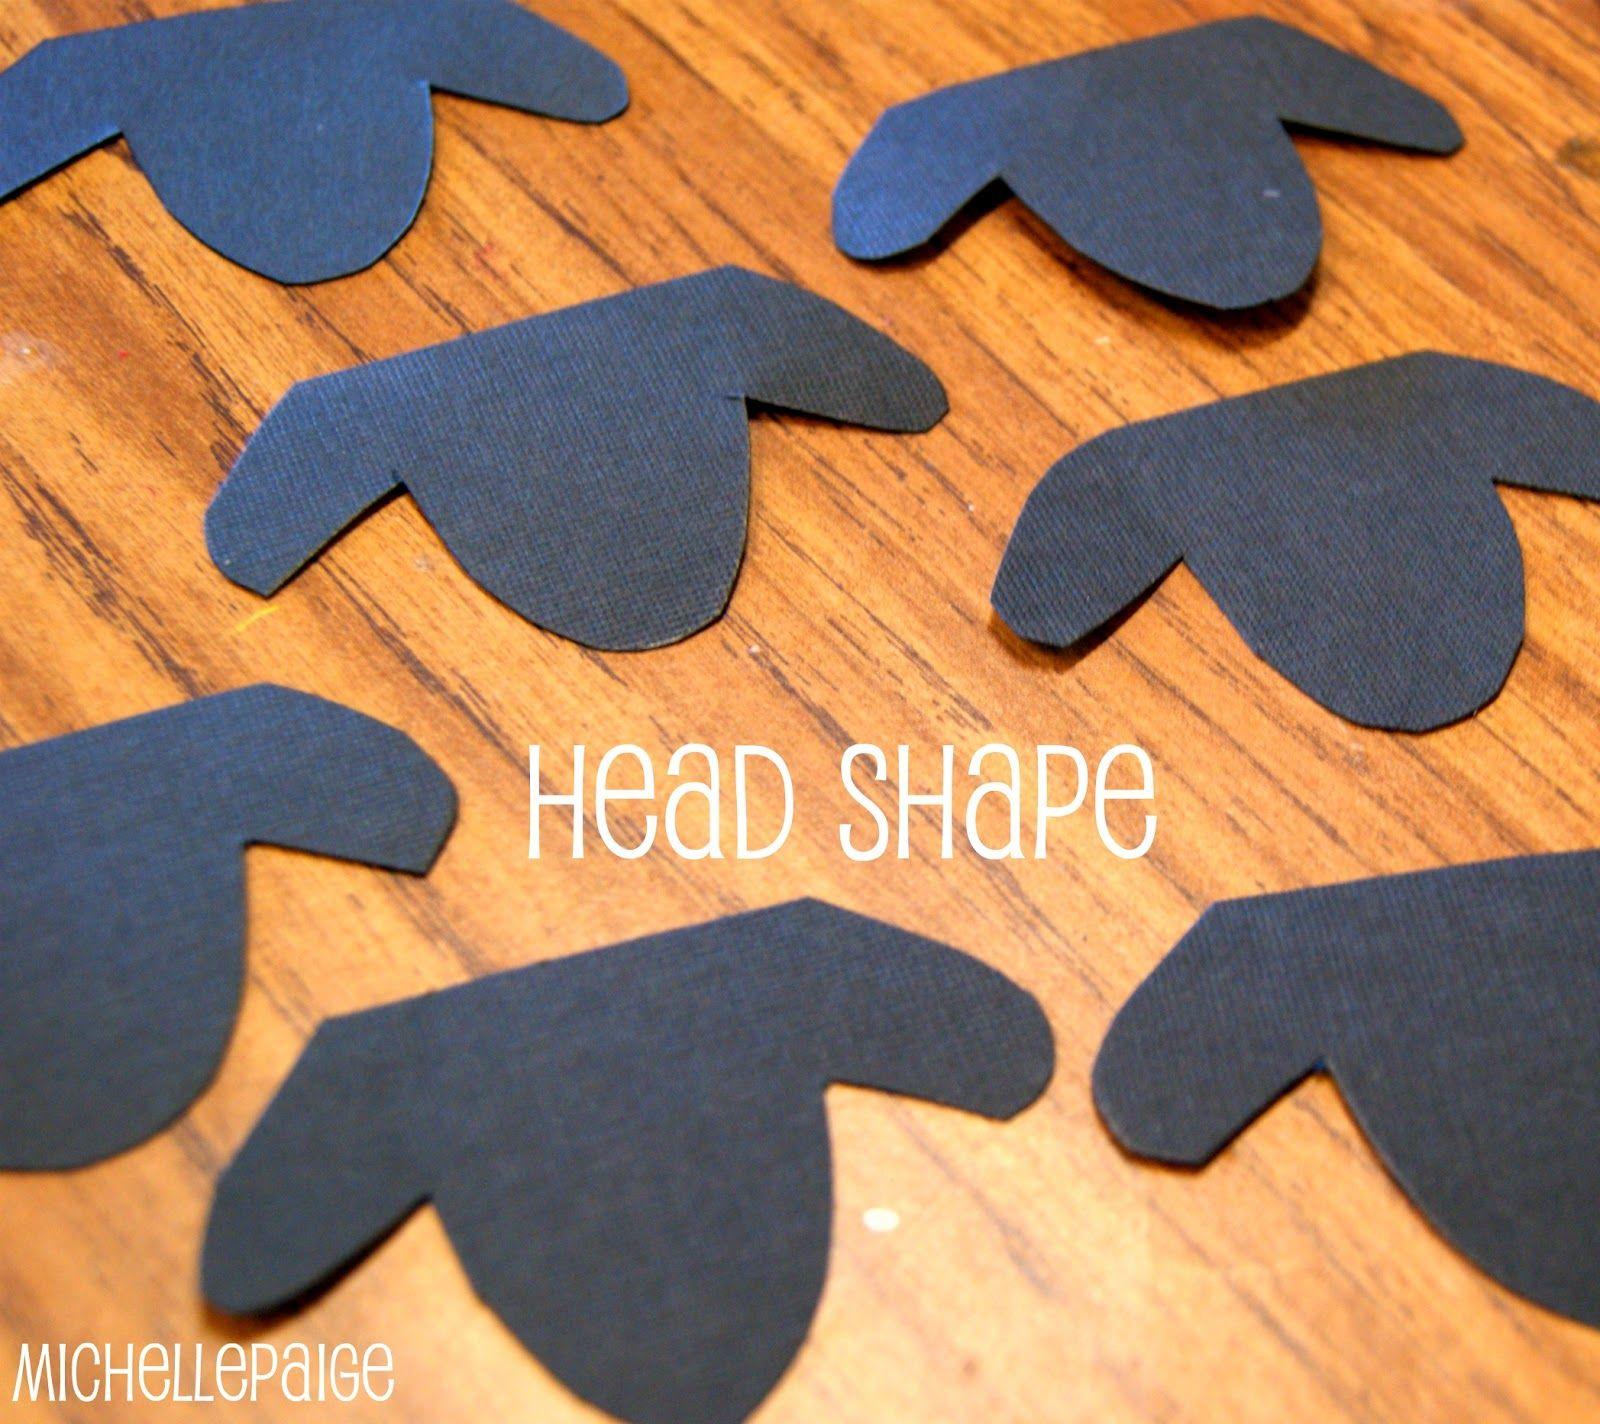 head shape idea for lamb craft teacher things pinterest head